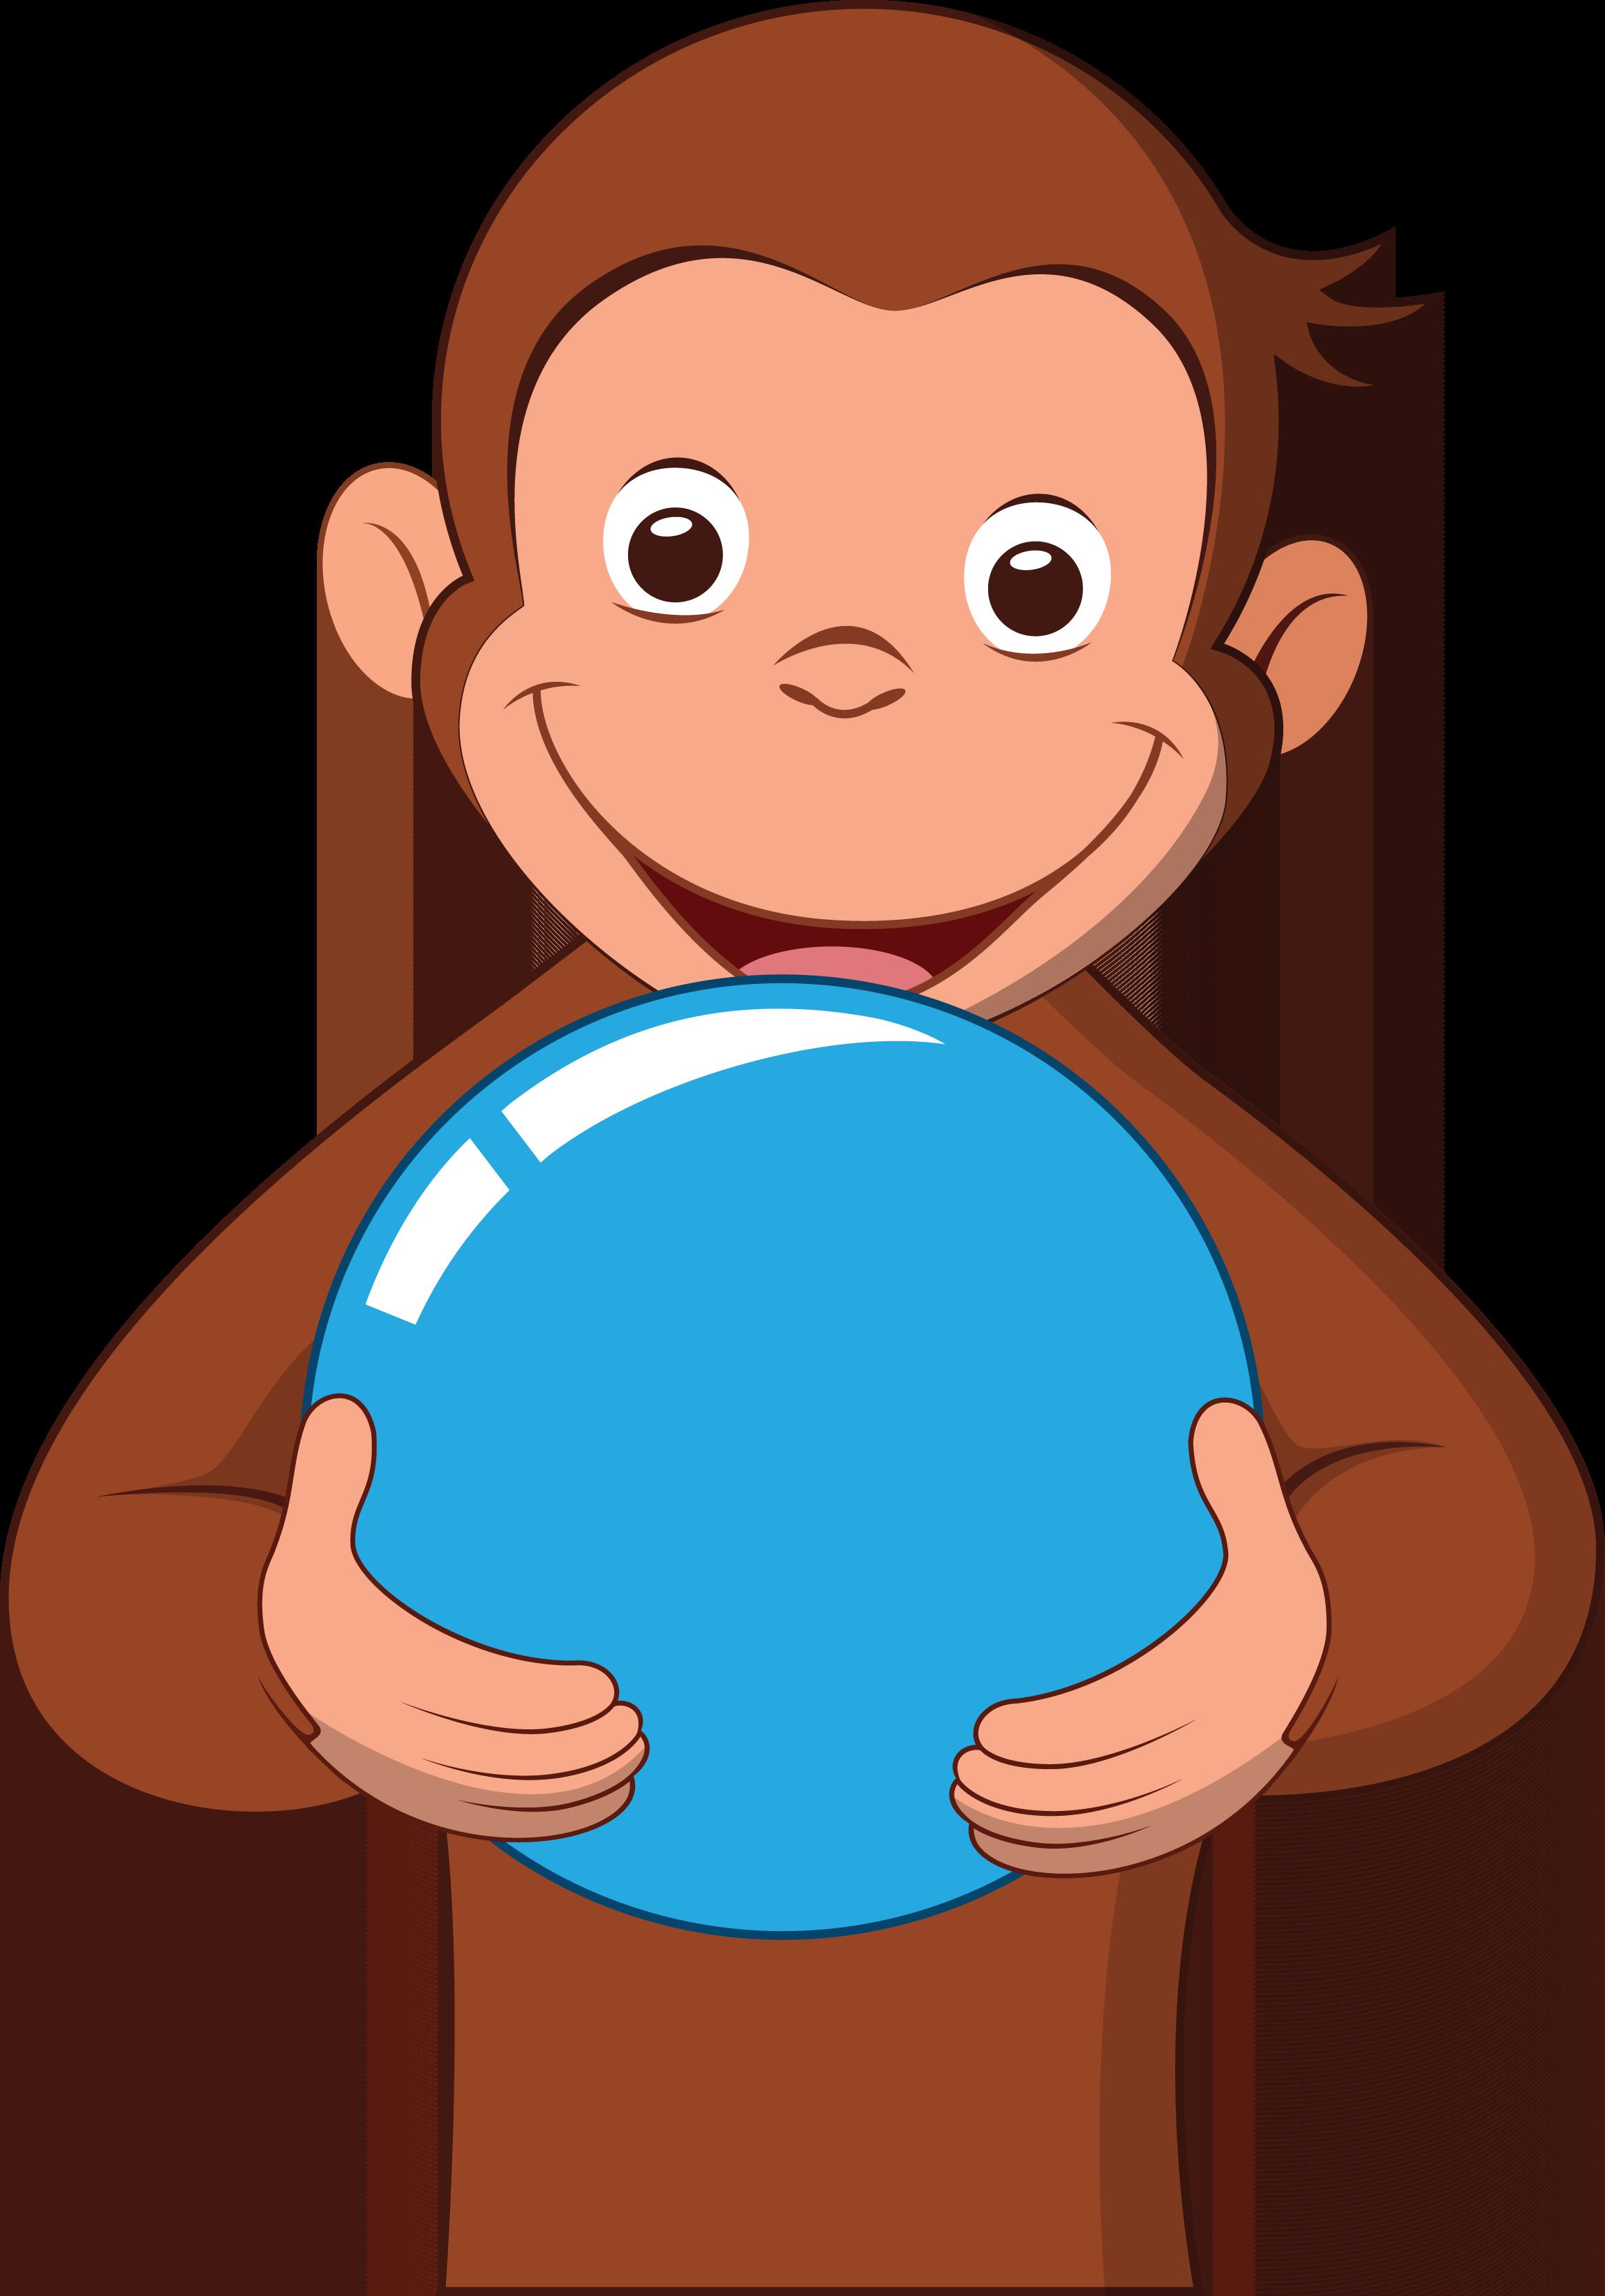 monkeys clipart curious george